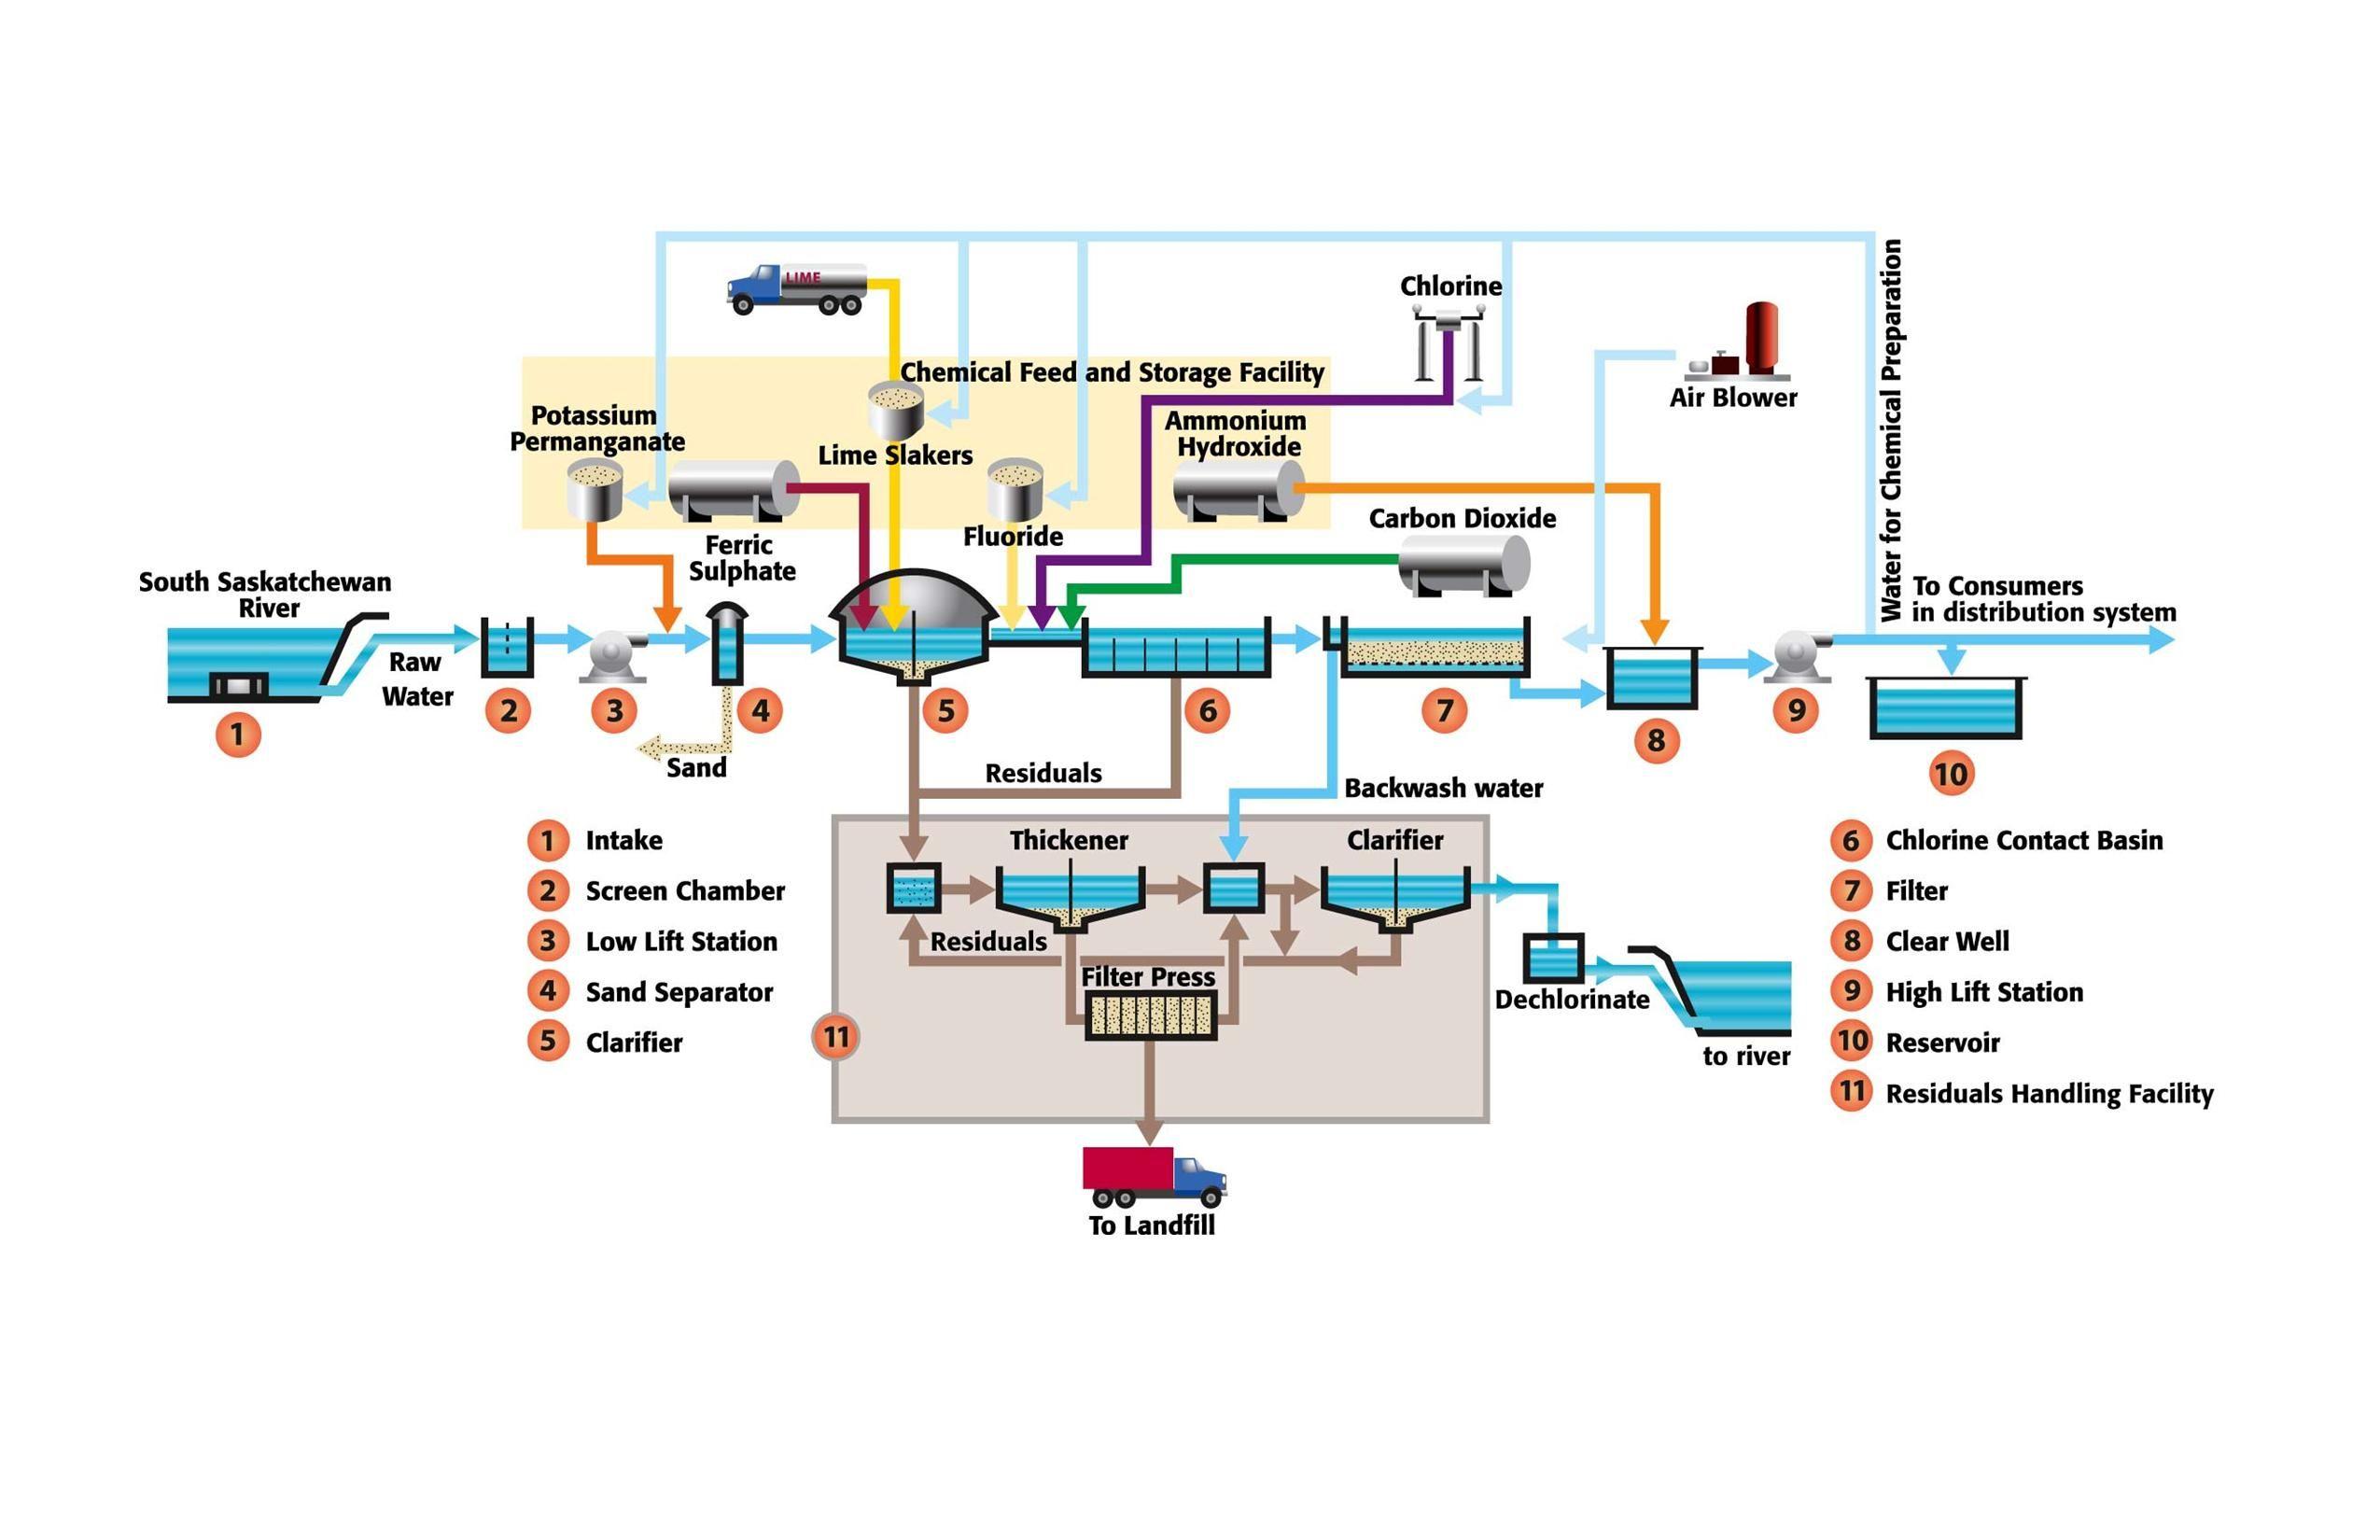 Wtp south saskatchewan river selected process charts pinterest wtp south saskatchewan river nvjuhfo Images